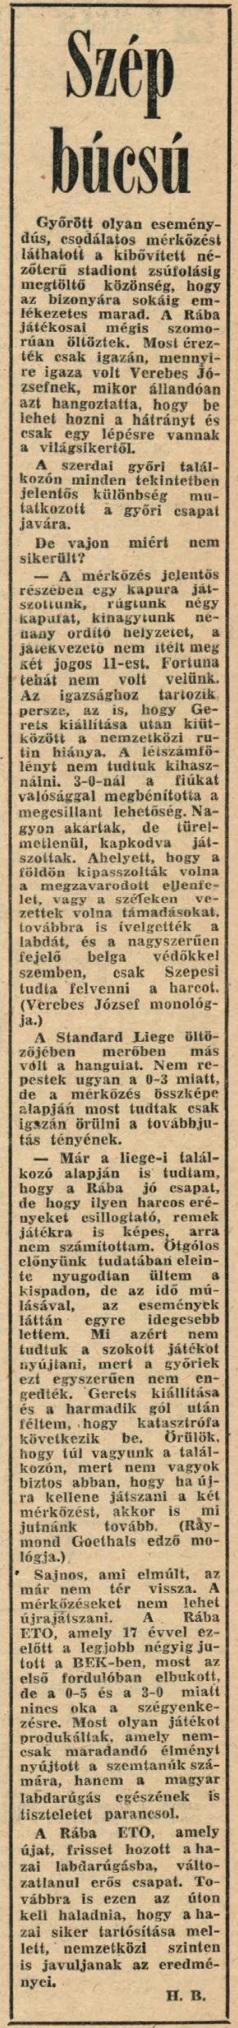 idokapszula_nb_i_1982_83_klubcsapataink_nemzetkozi_kupaszereplese_1_fordulo_2_kor_raba_eto_standard_liege_2.jpg